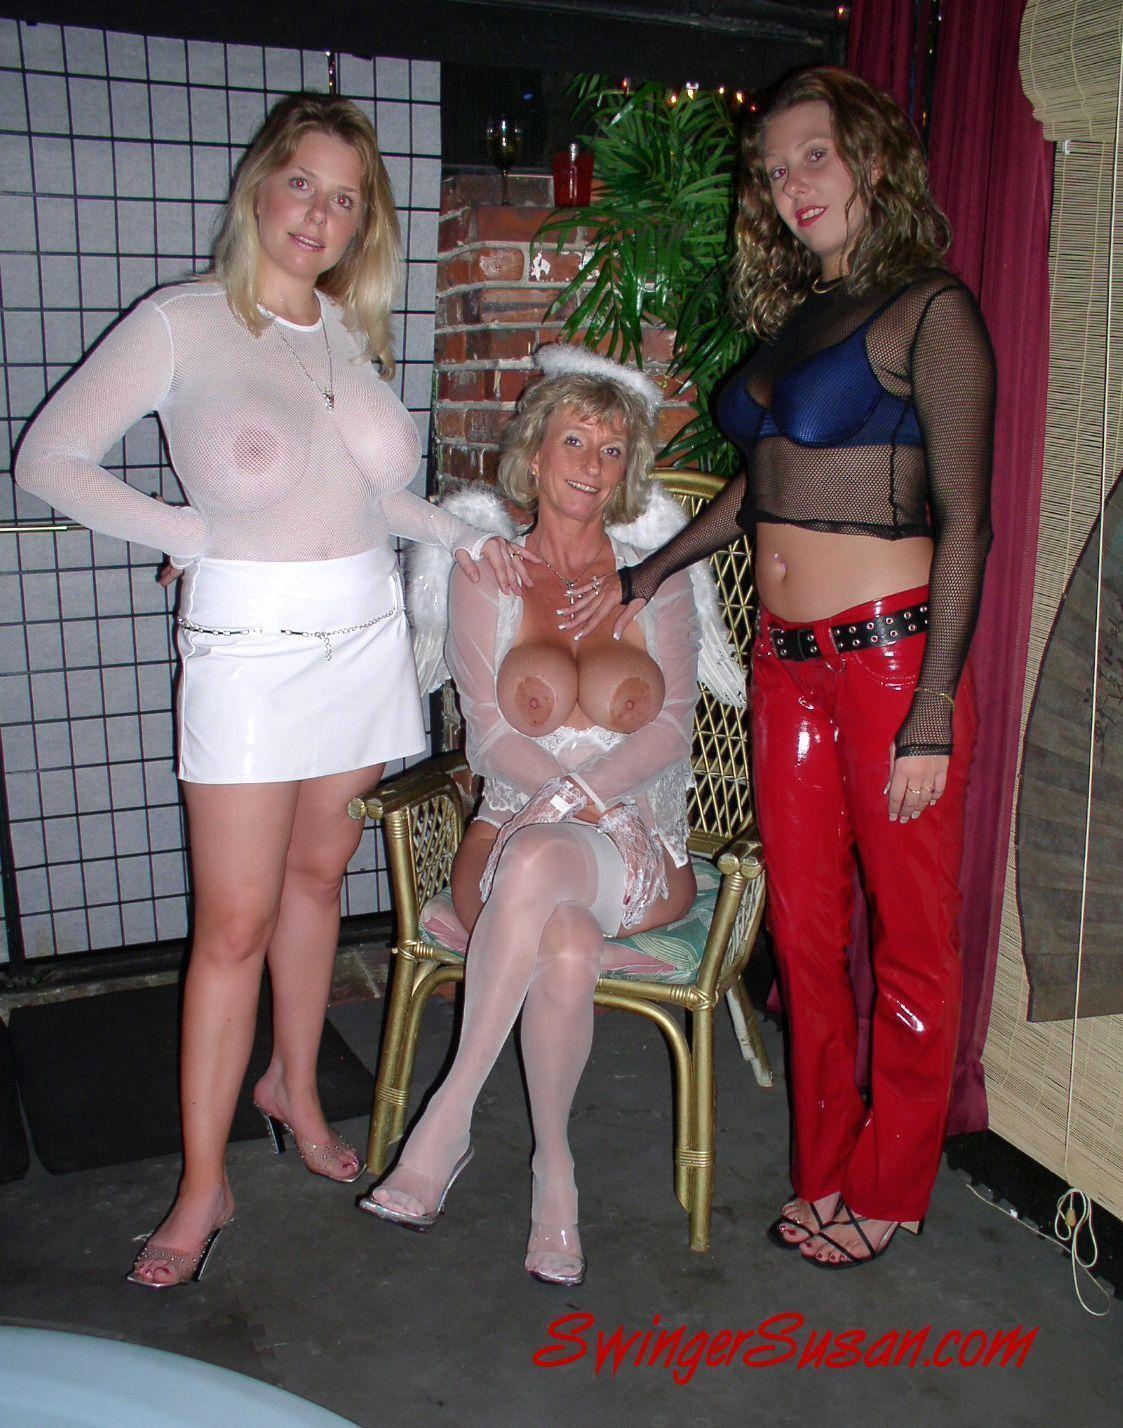 this amateur sex with hostesses seems brilliant